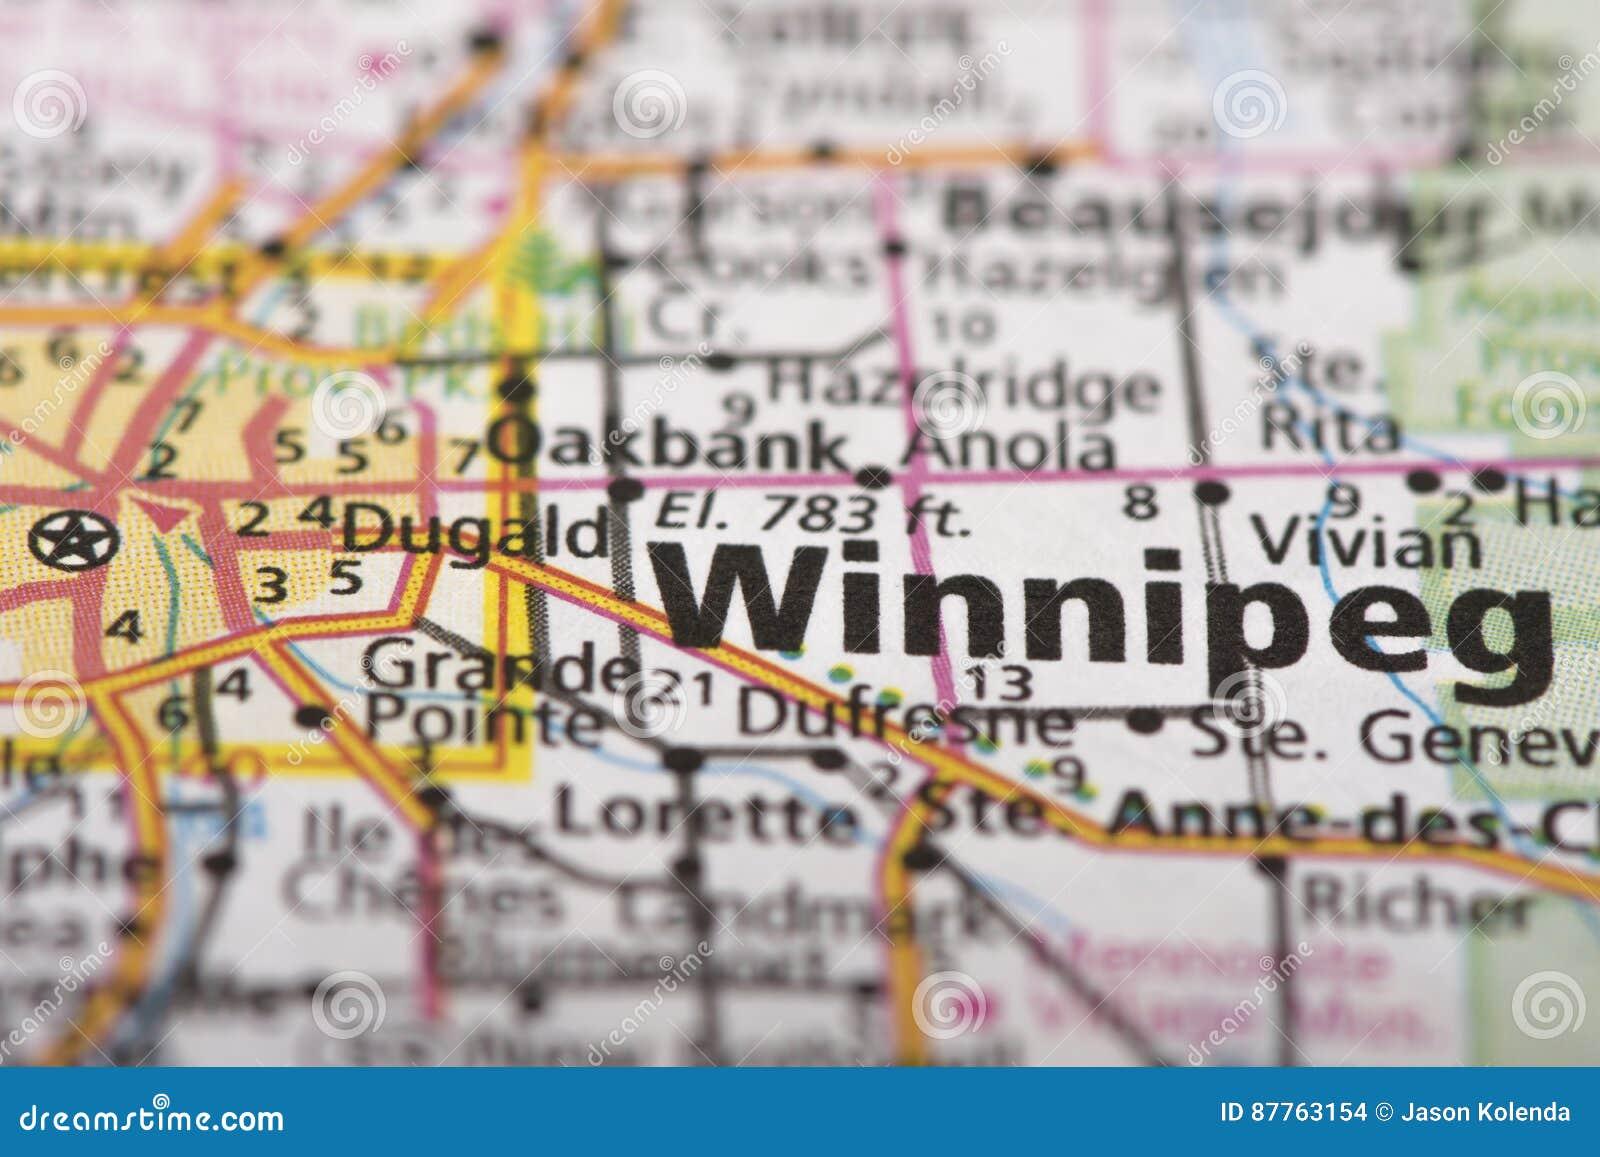 Carte Canada Manitoba.Winnipeg Manitoba Sur La Carte Photo Stock Image Du Winnipeg